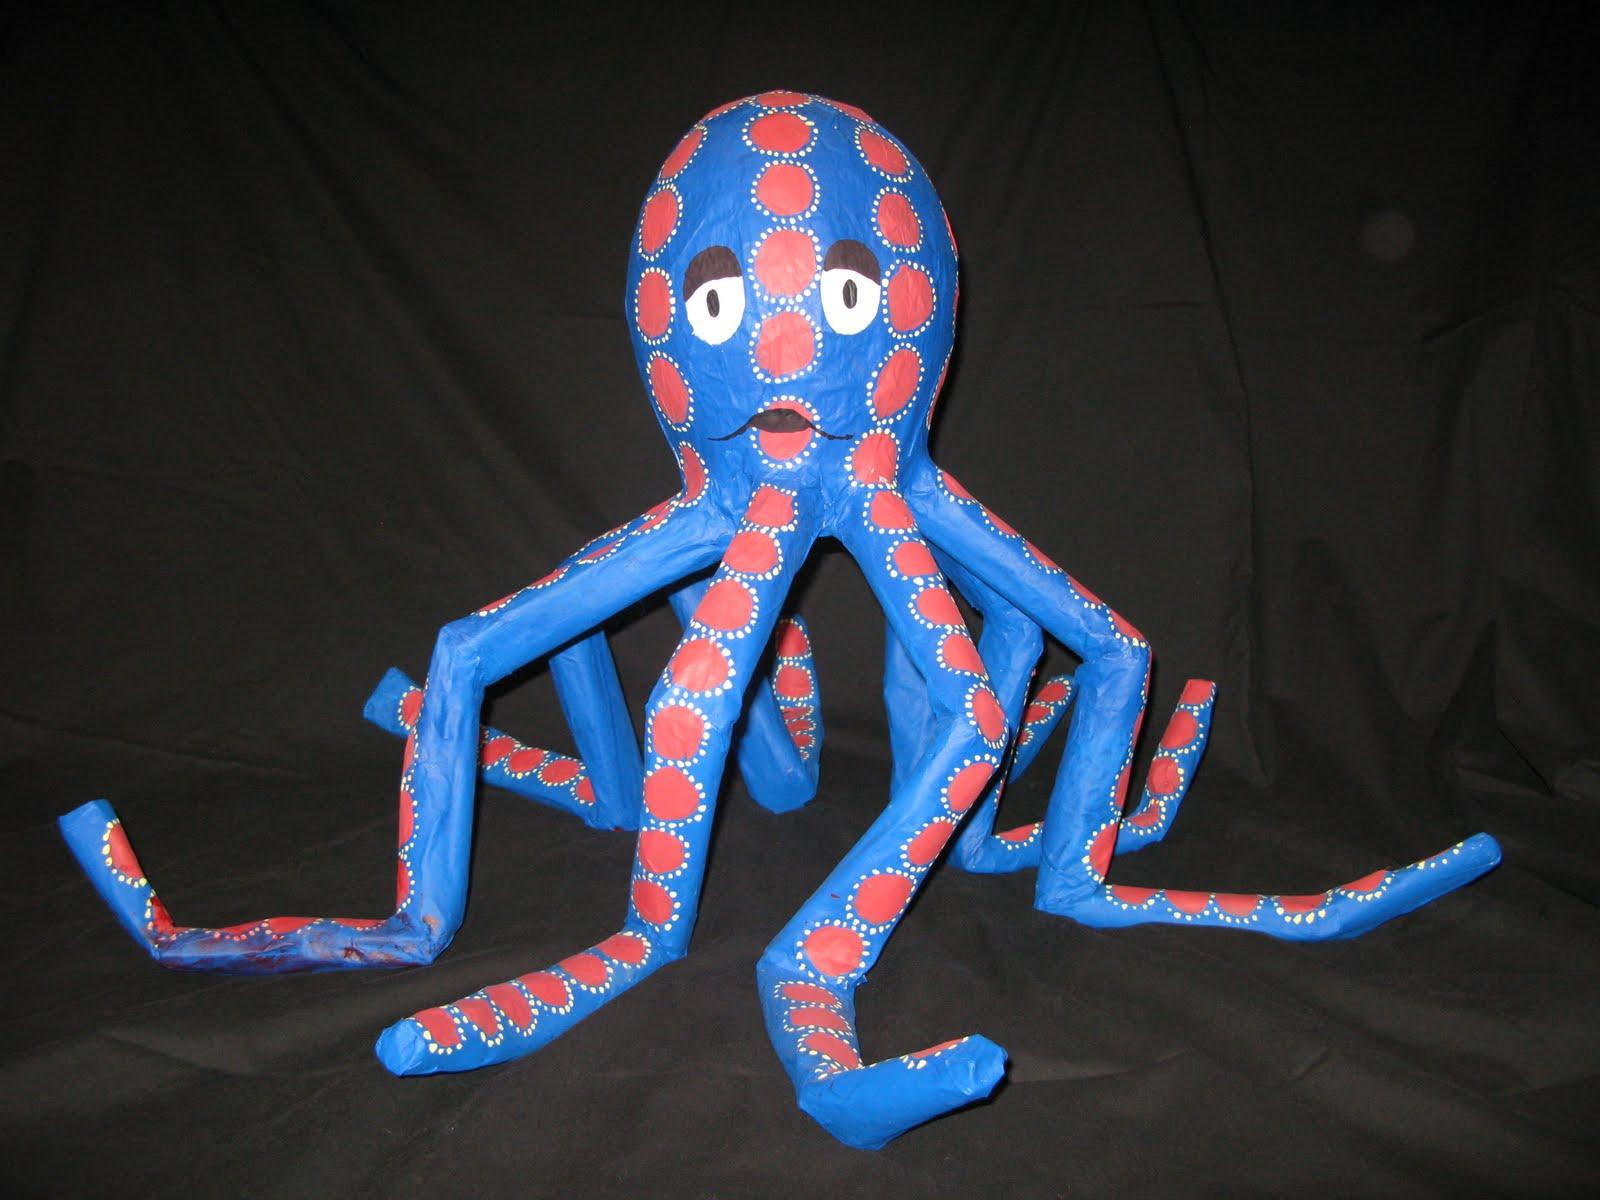 http://2.bp.blogspot.com/-GhCt-cNfj_8/TfBWX0xYHRI/AAAAAAAAAHc/kyWCJjWhz9k/s1600/Octopus.JPG